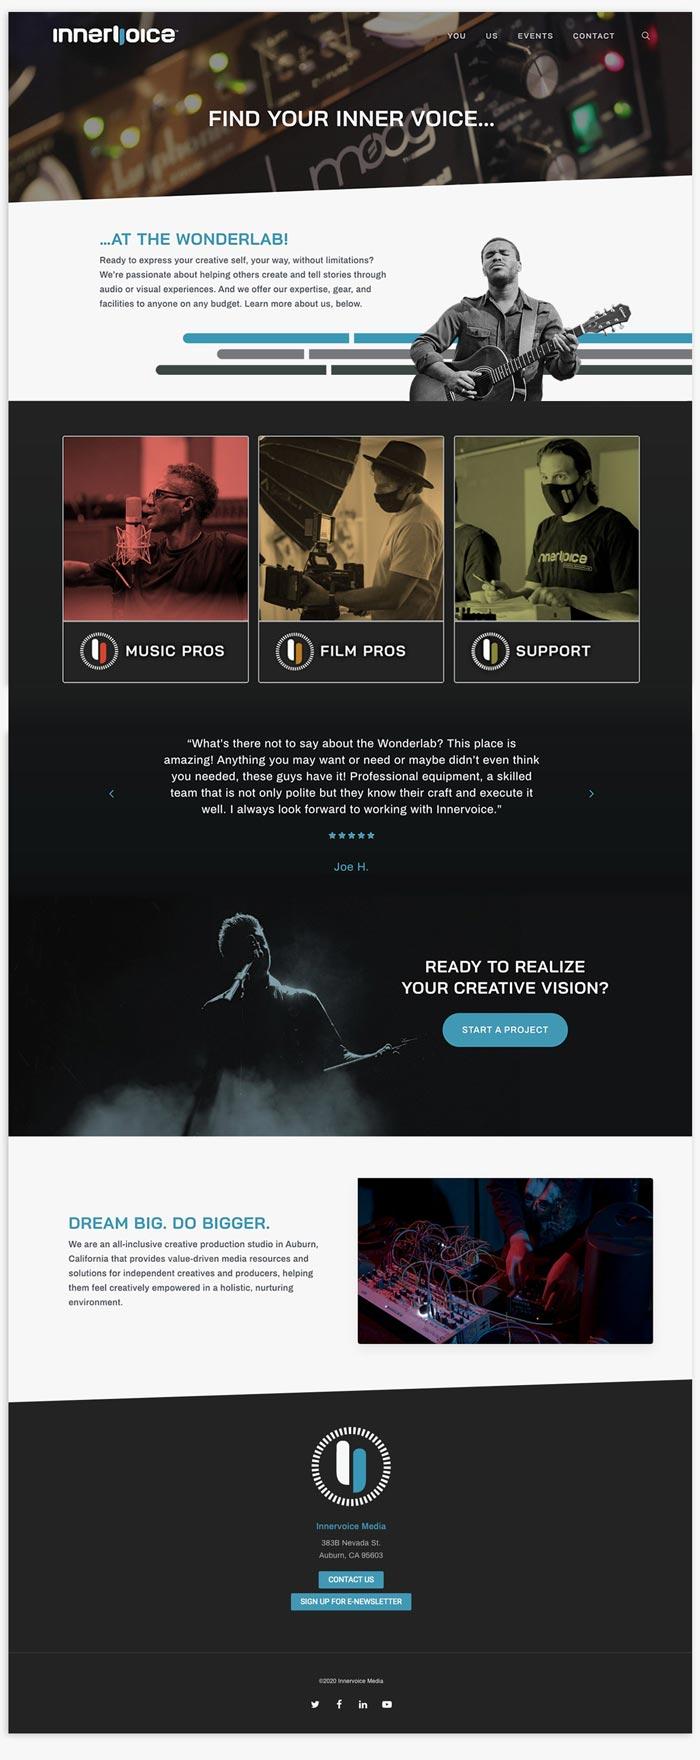 Innervoice Creative WonderLab website home page layout